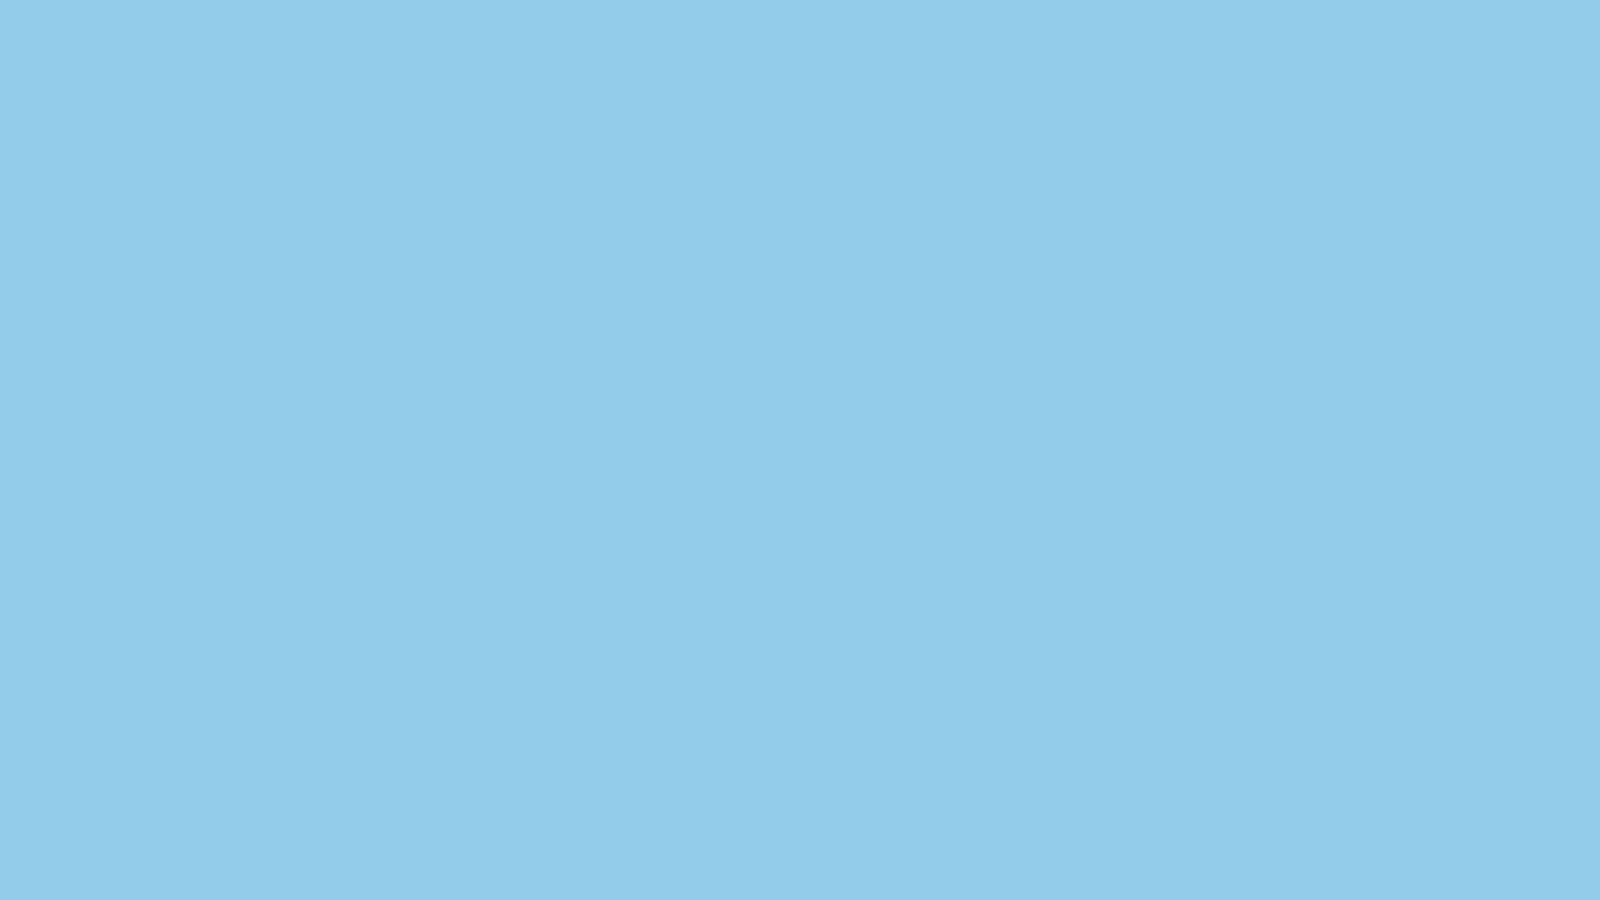 1600x900 Light Cornflower Blue Solid Color Background